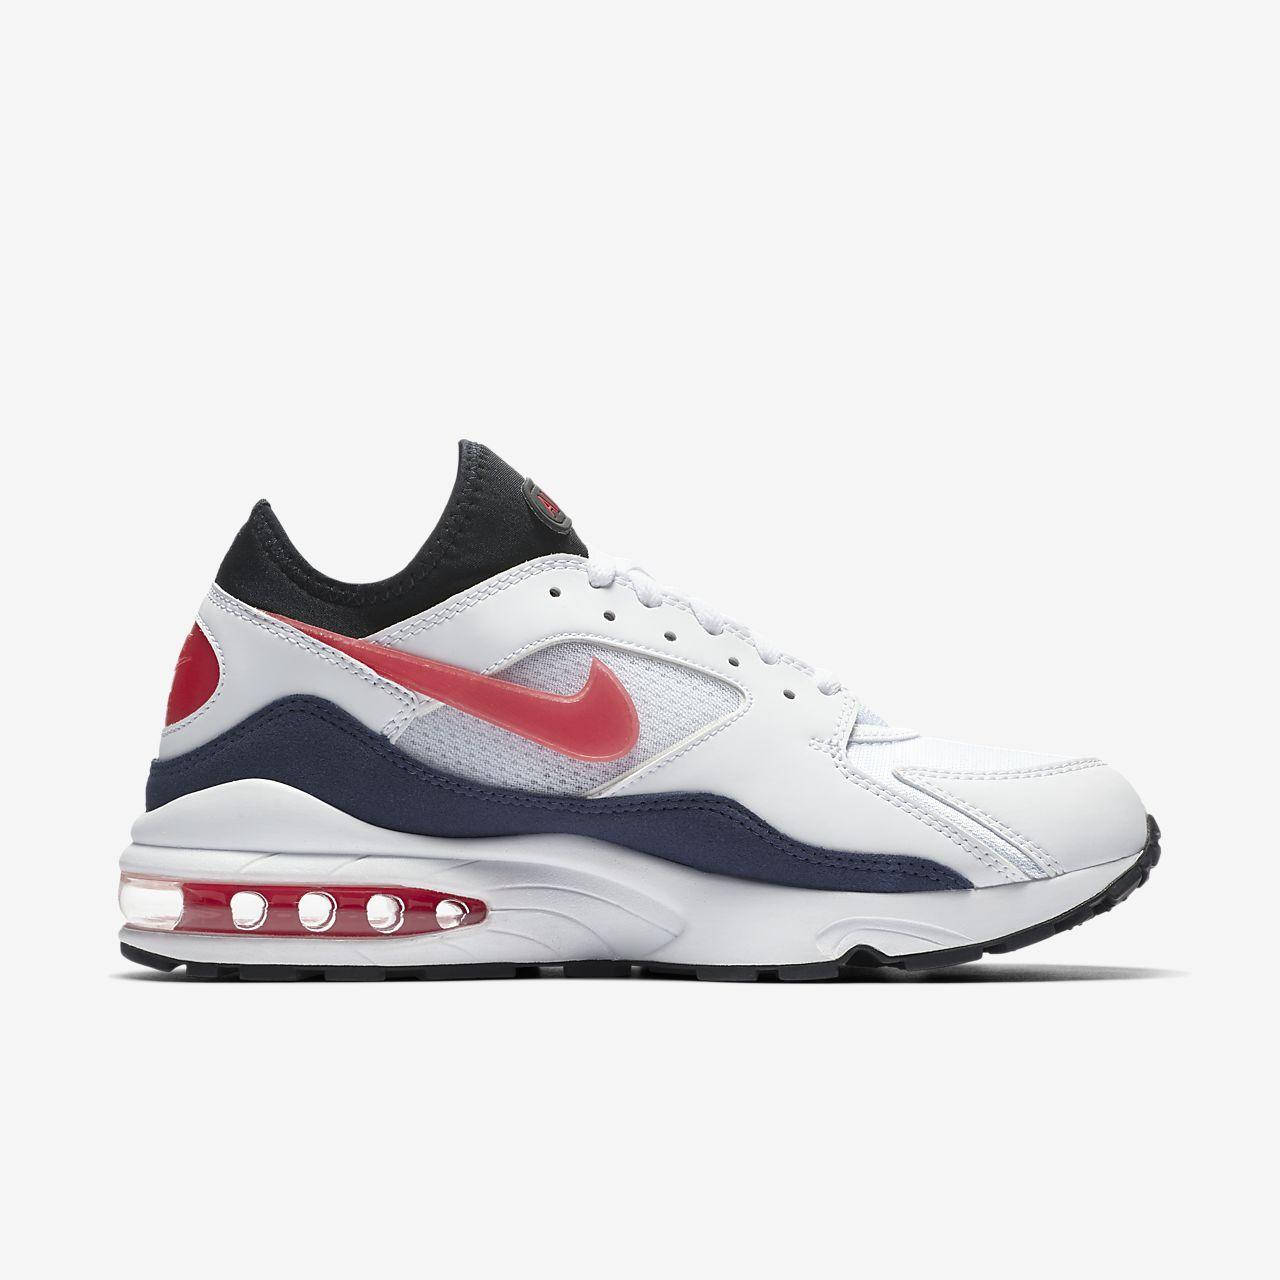 sale retailer 38304 373b3 Nike Air Max 93 Mens Shoe. Nike.com NL